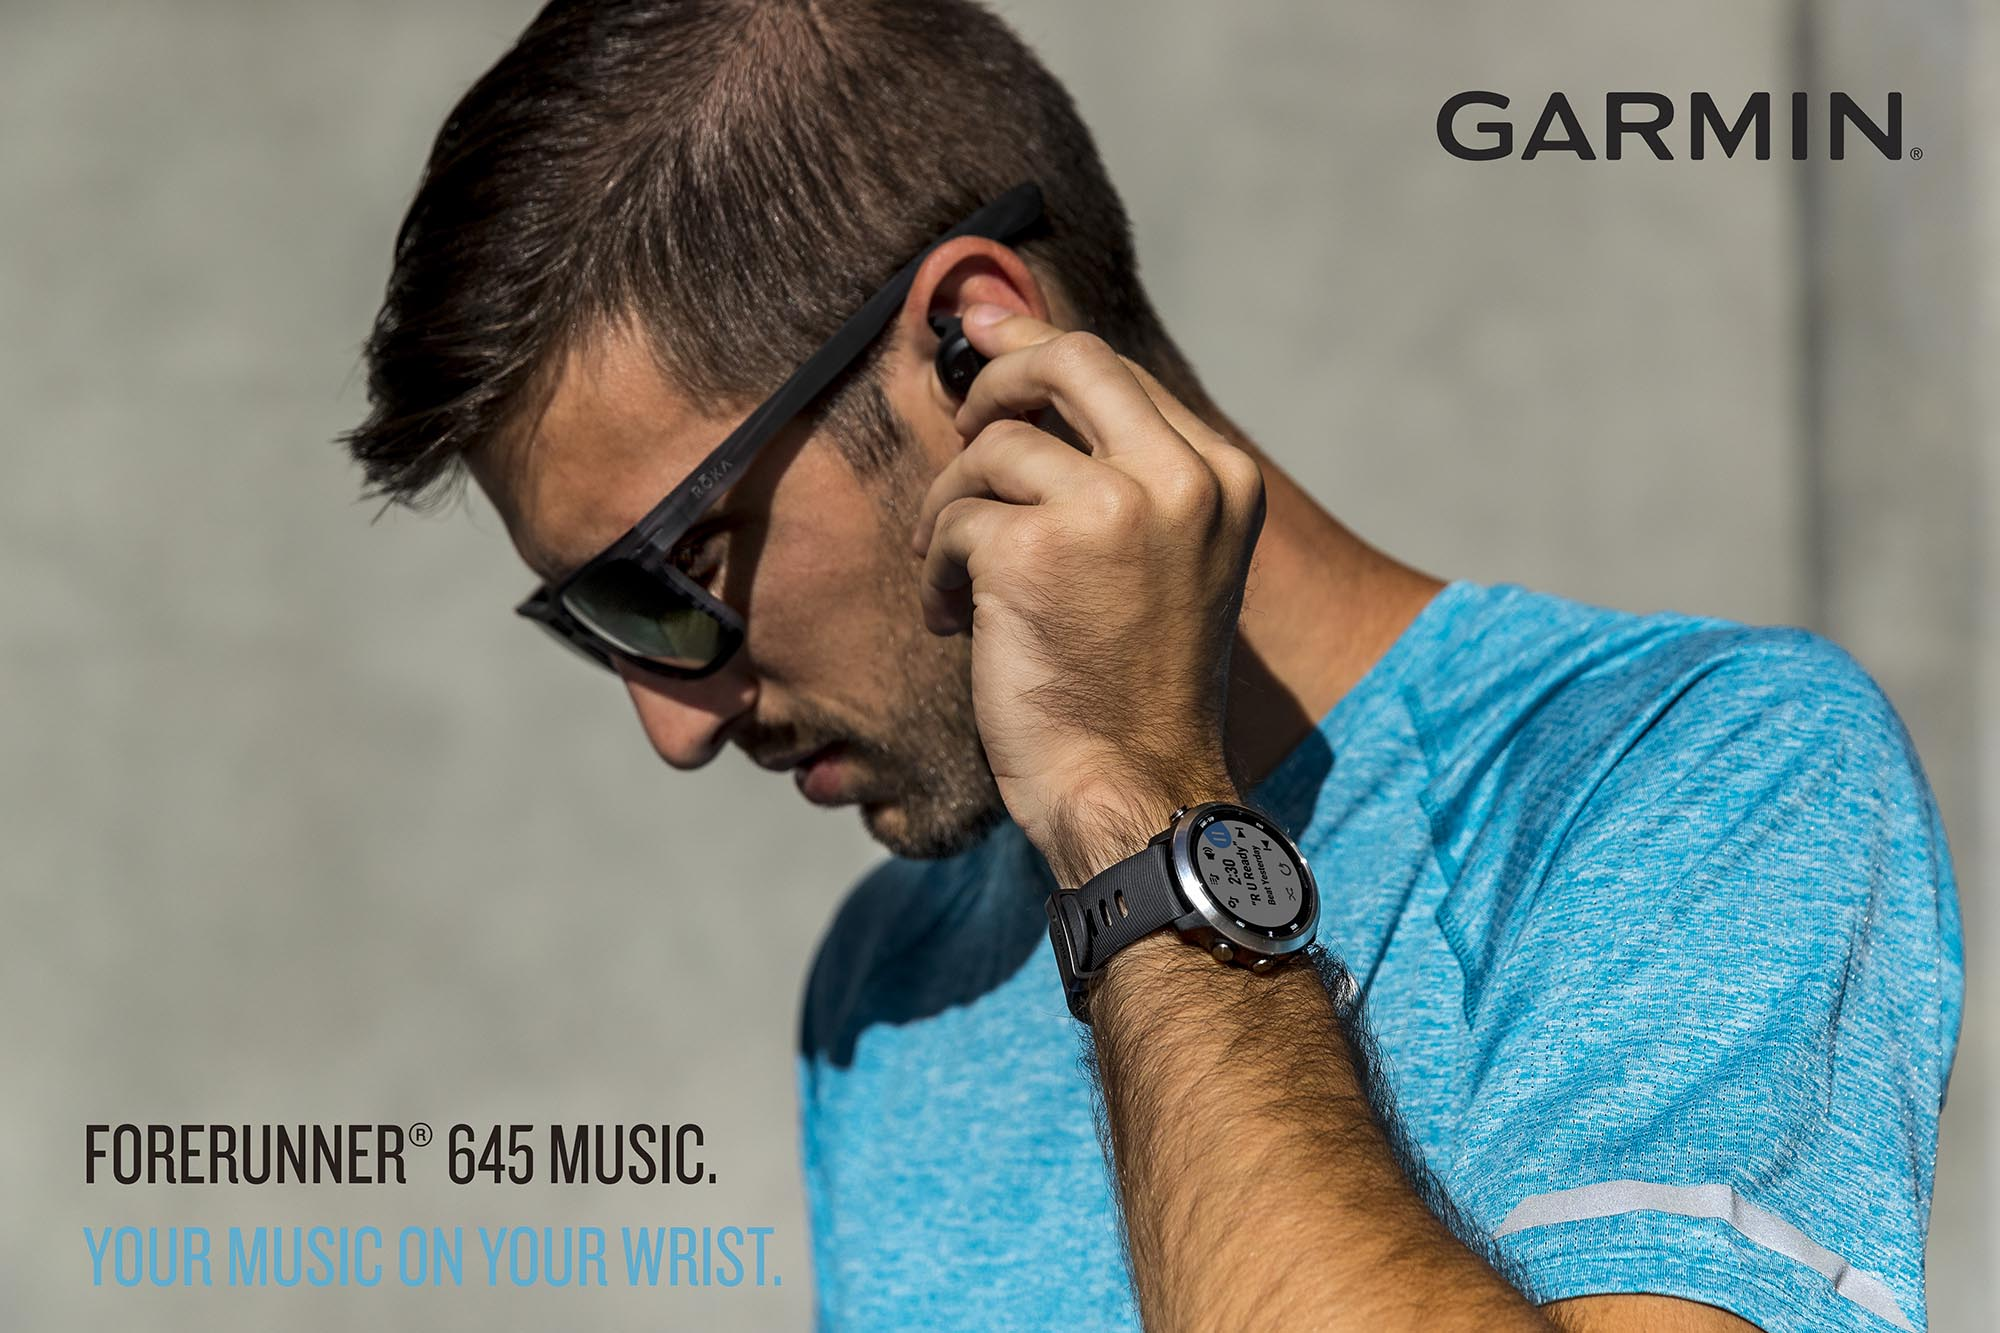 Garmin Forerunner 645 Music 進階功能  支援入歌跑步聽